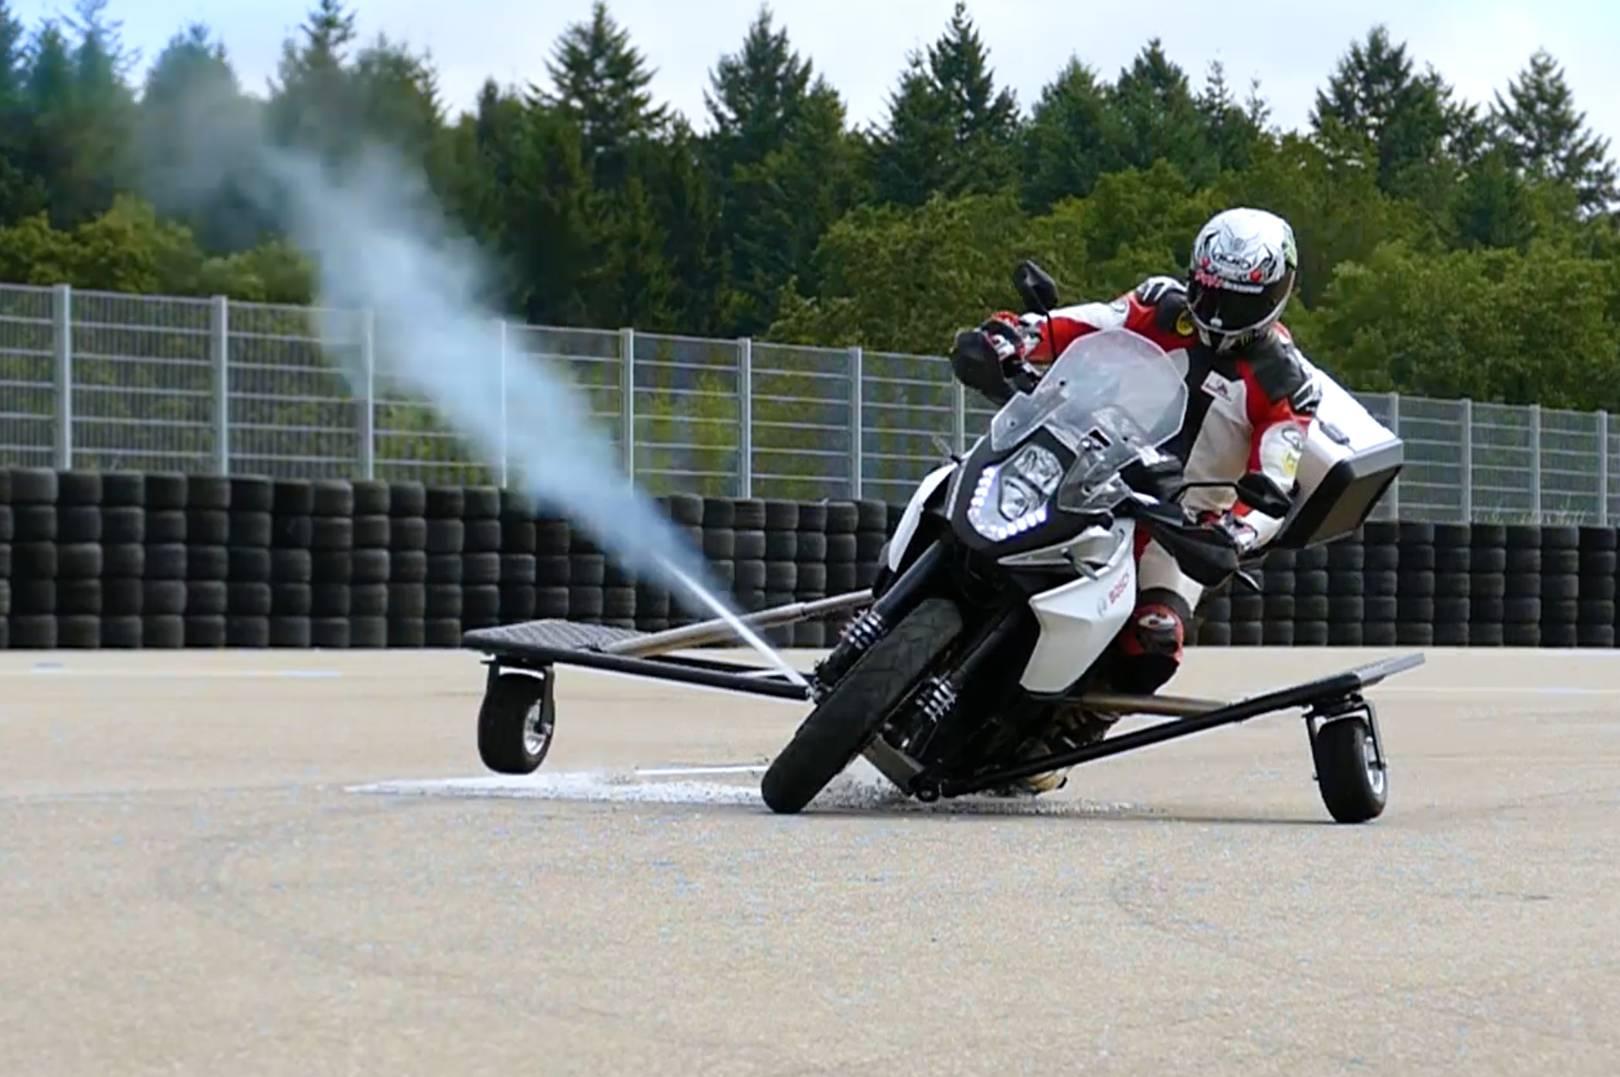 Image result for bosch motorbike slipping corner